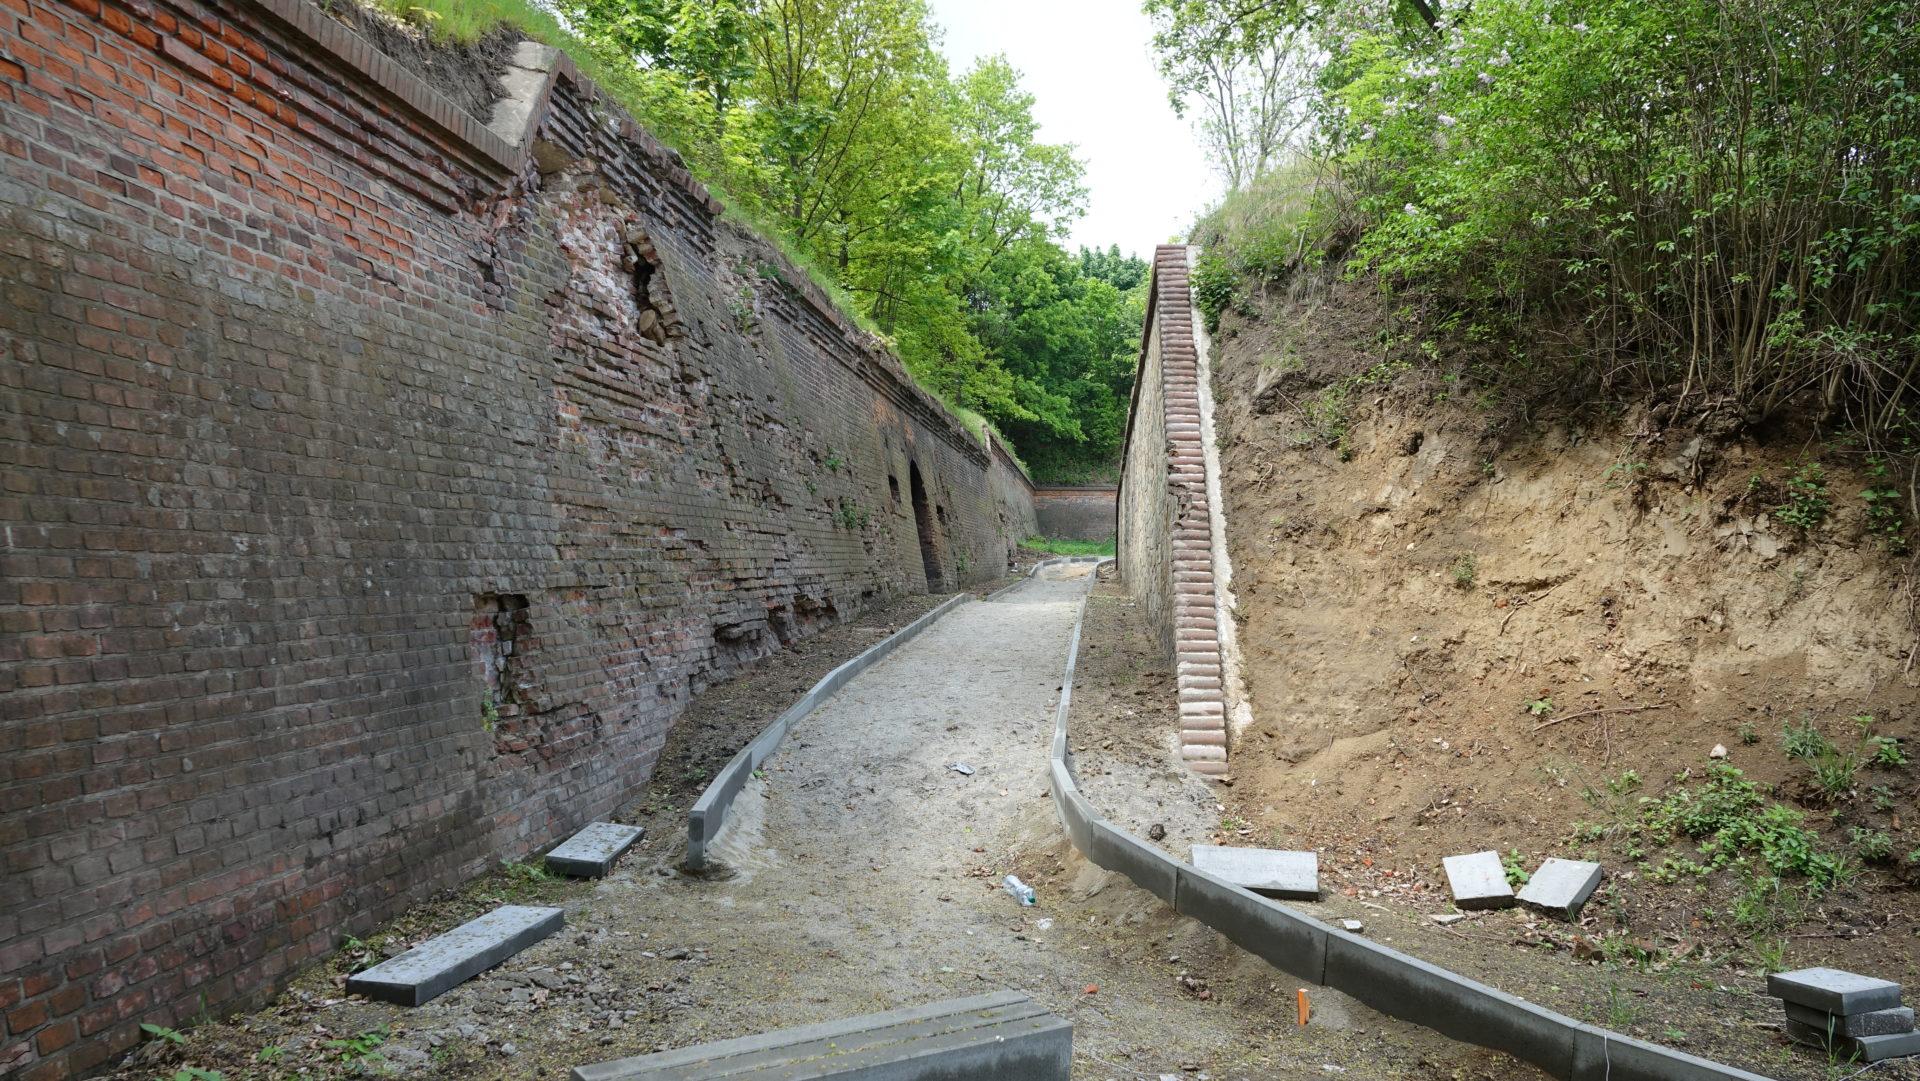 Zaawansowane prace na nyskich fortach – Gmina Nysa